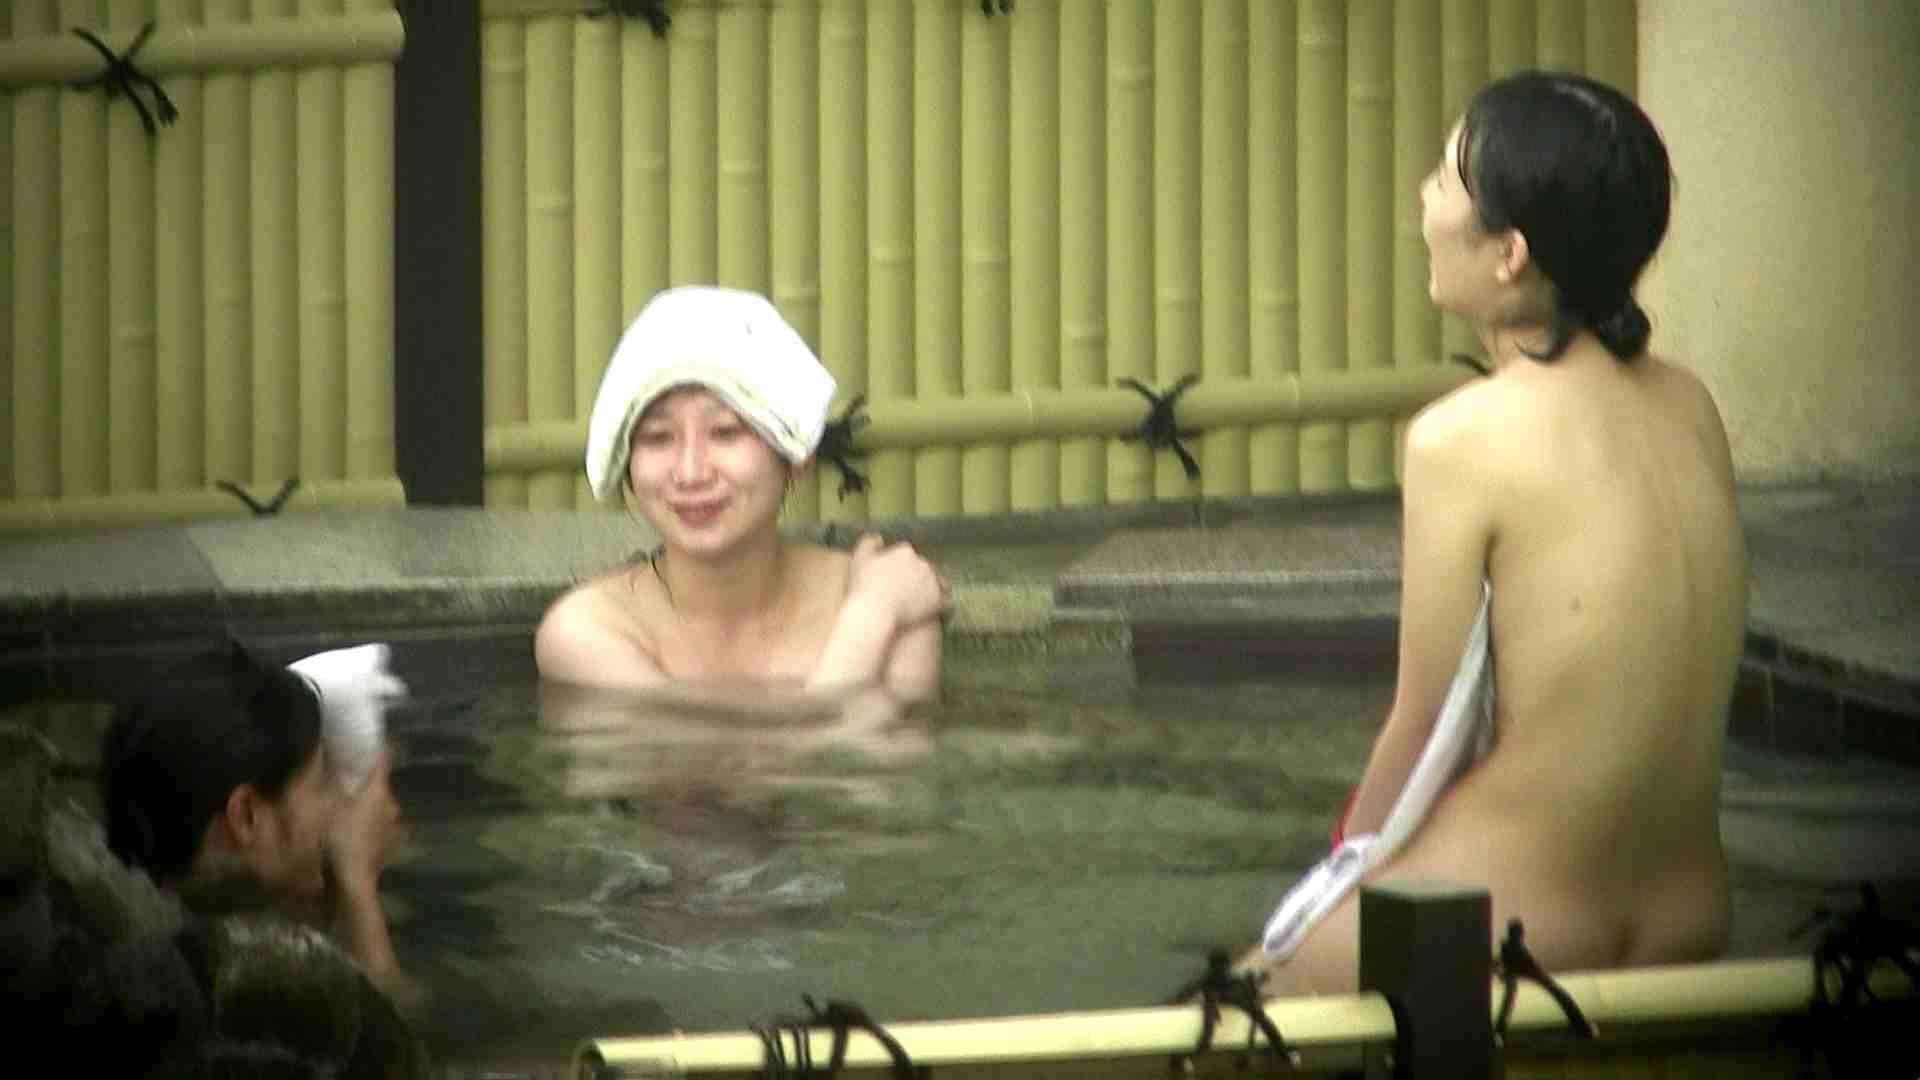 Aquaな露天風呂Vol.635 露天風呂編 | 盗撮シリーズ  77PIX 43